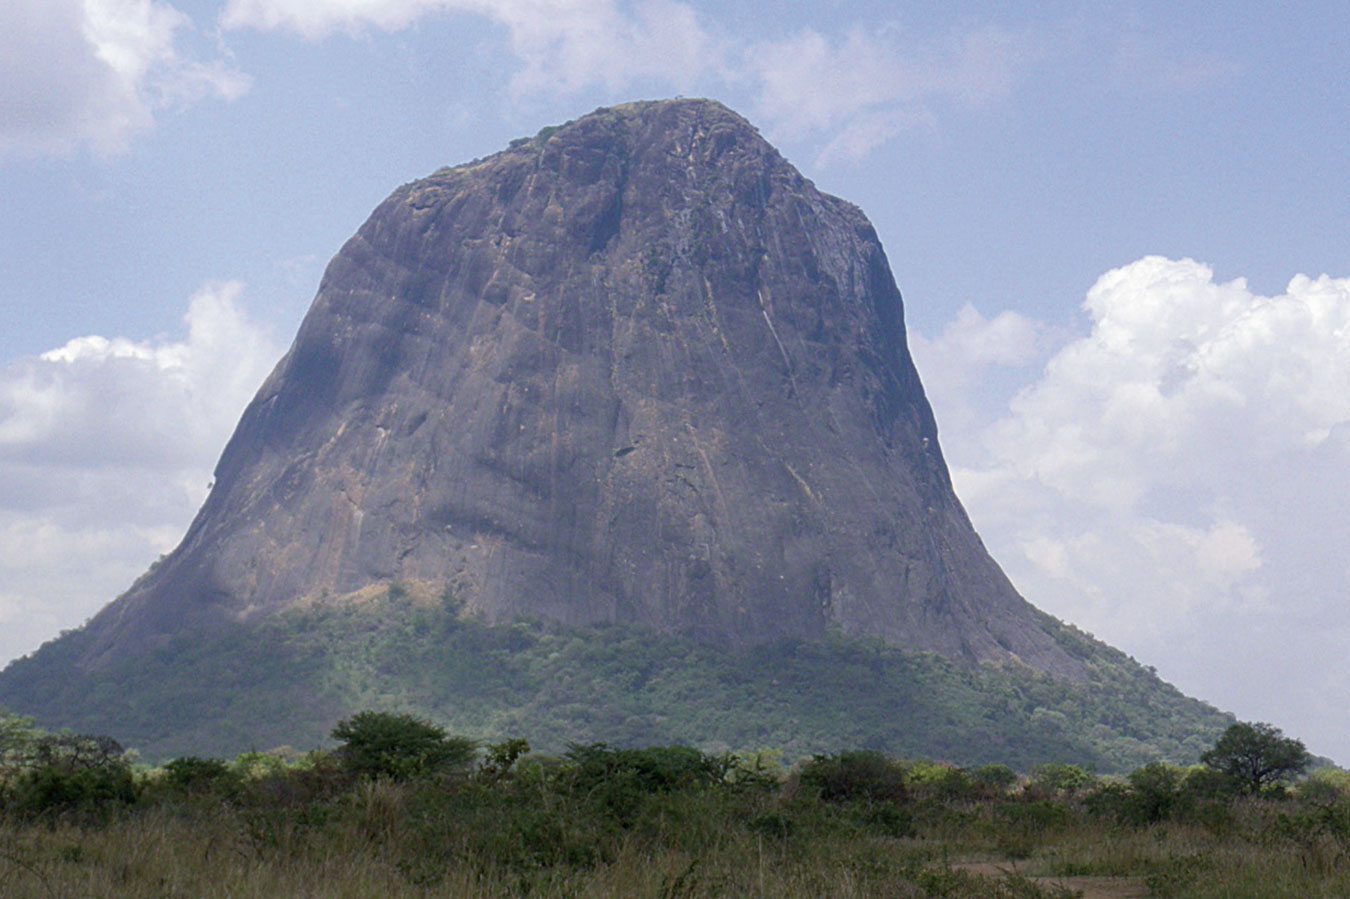 kara-tunga-abim-Rock-Climbing-Uganda-Granite-Ruoth-Amyel-2